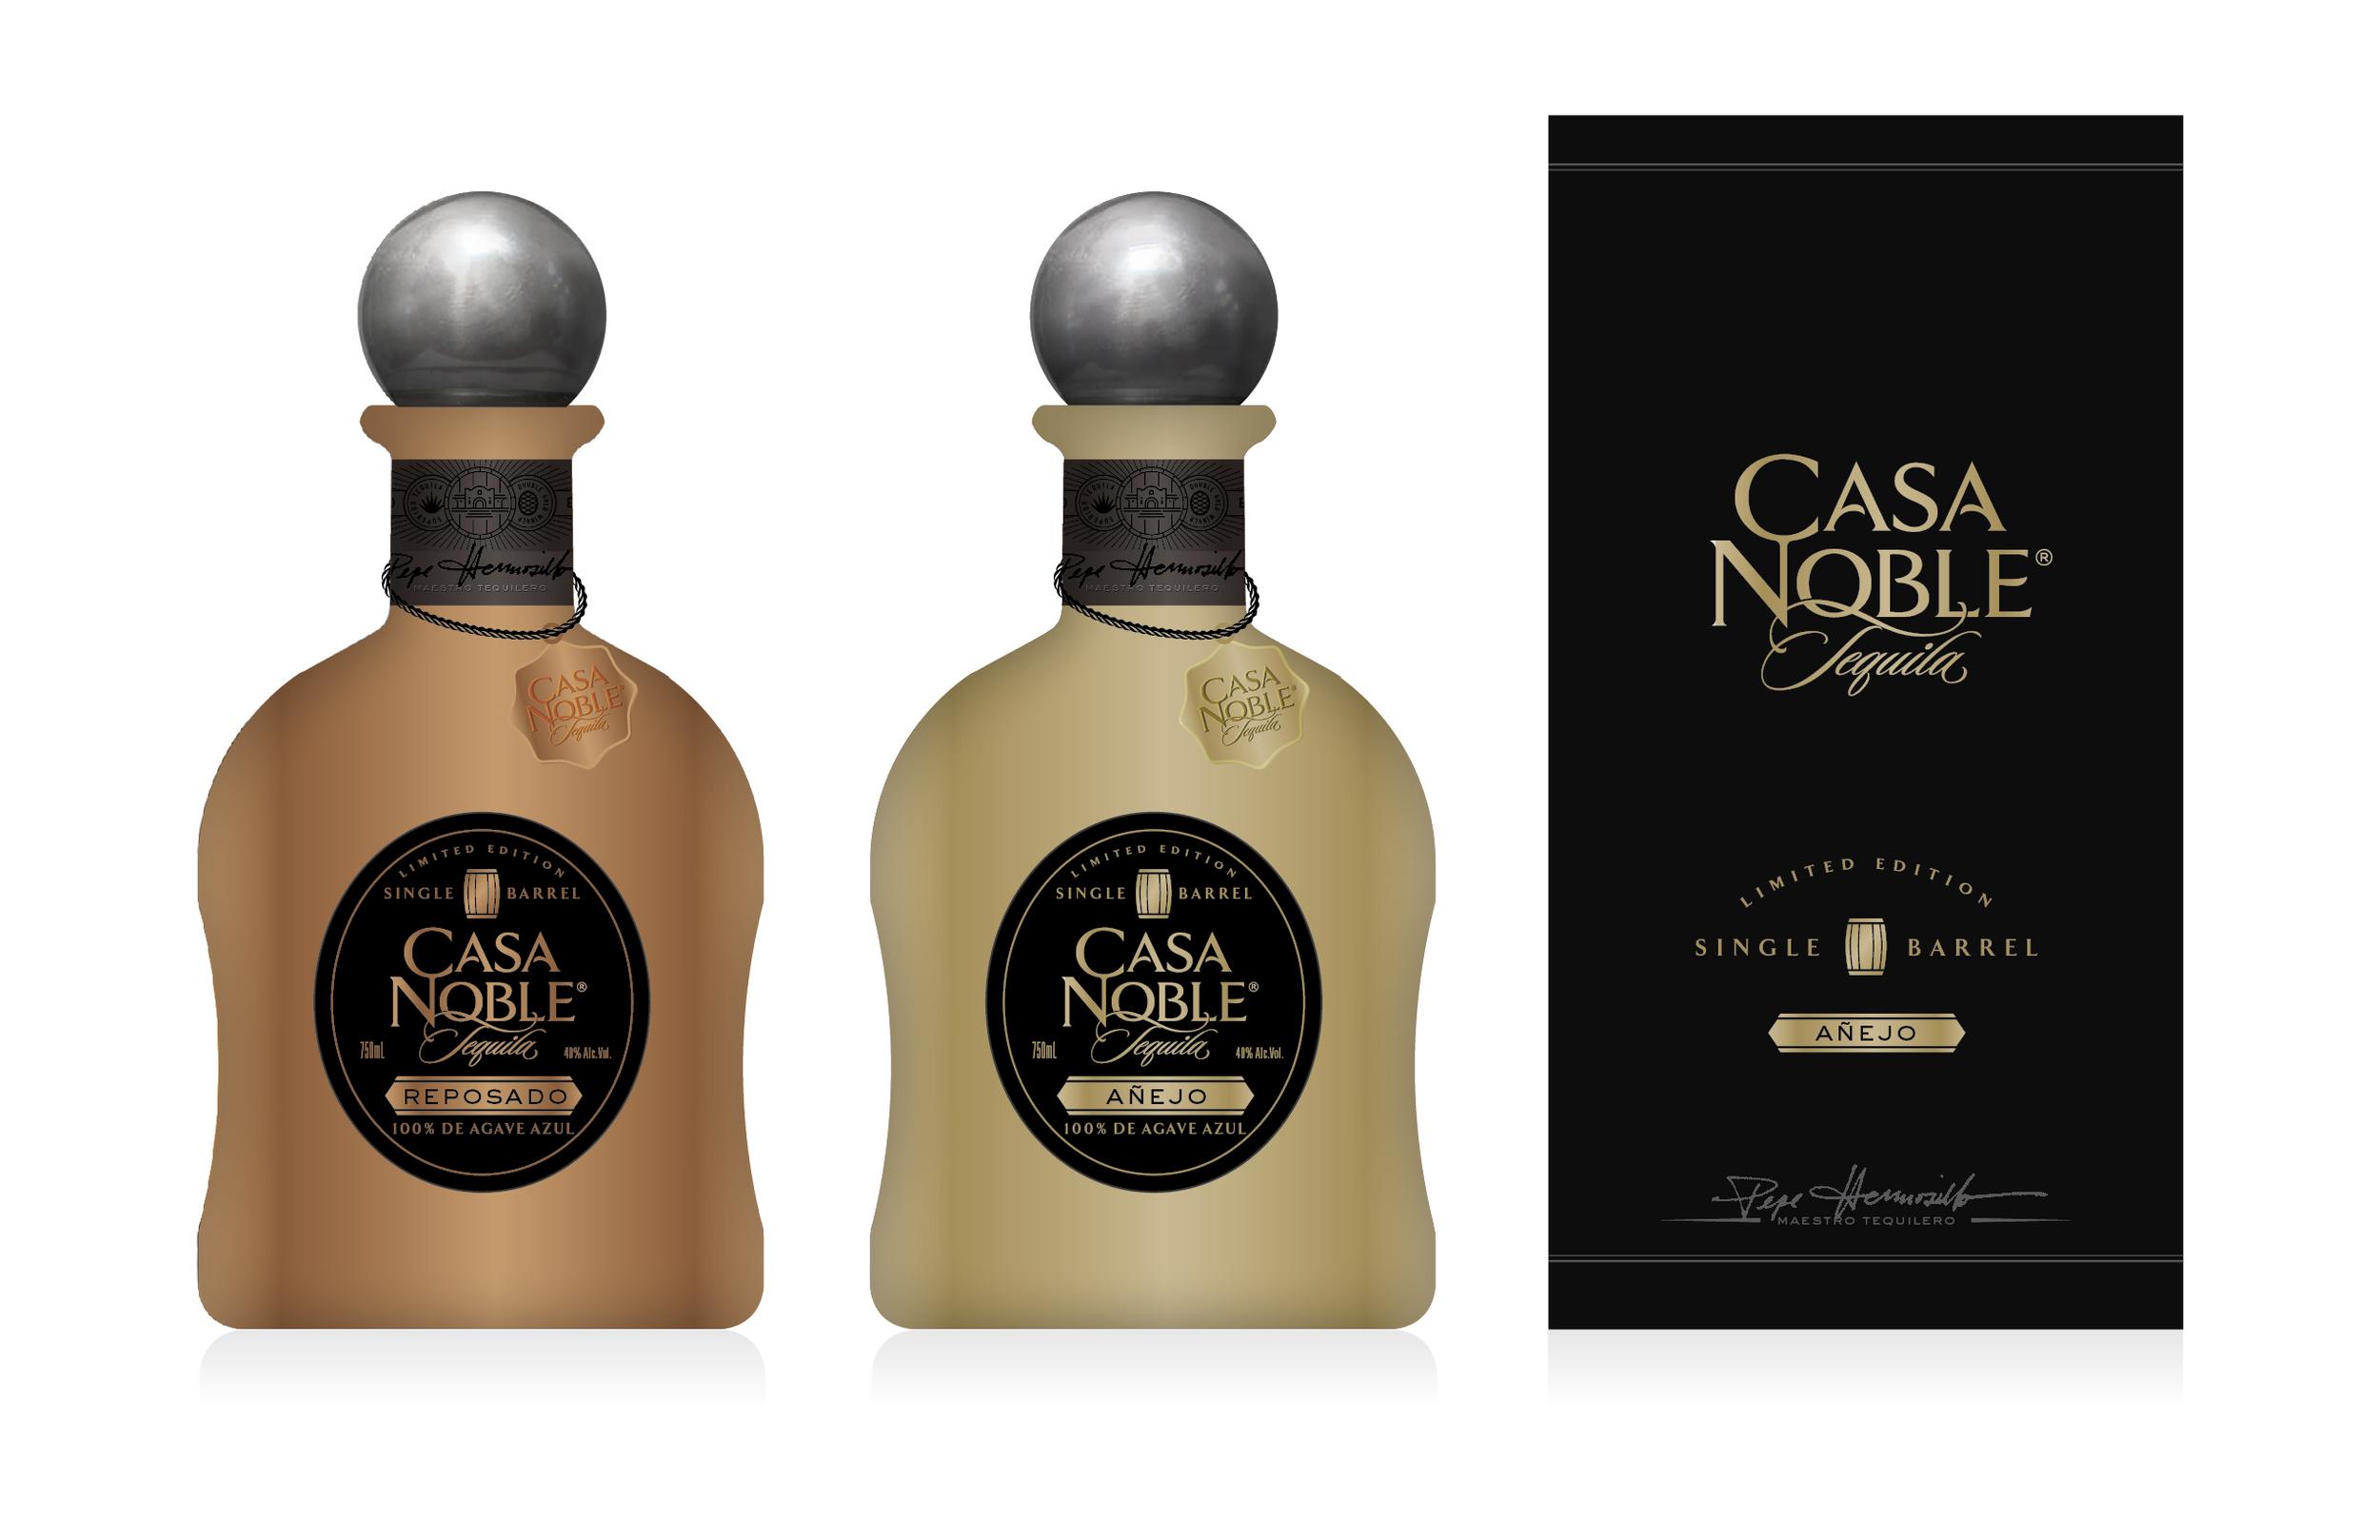 Casa Noble Single Barrel Tequila